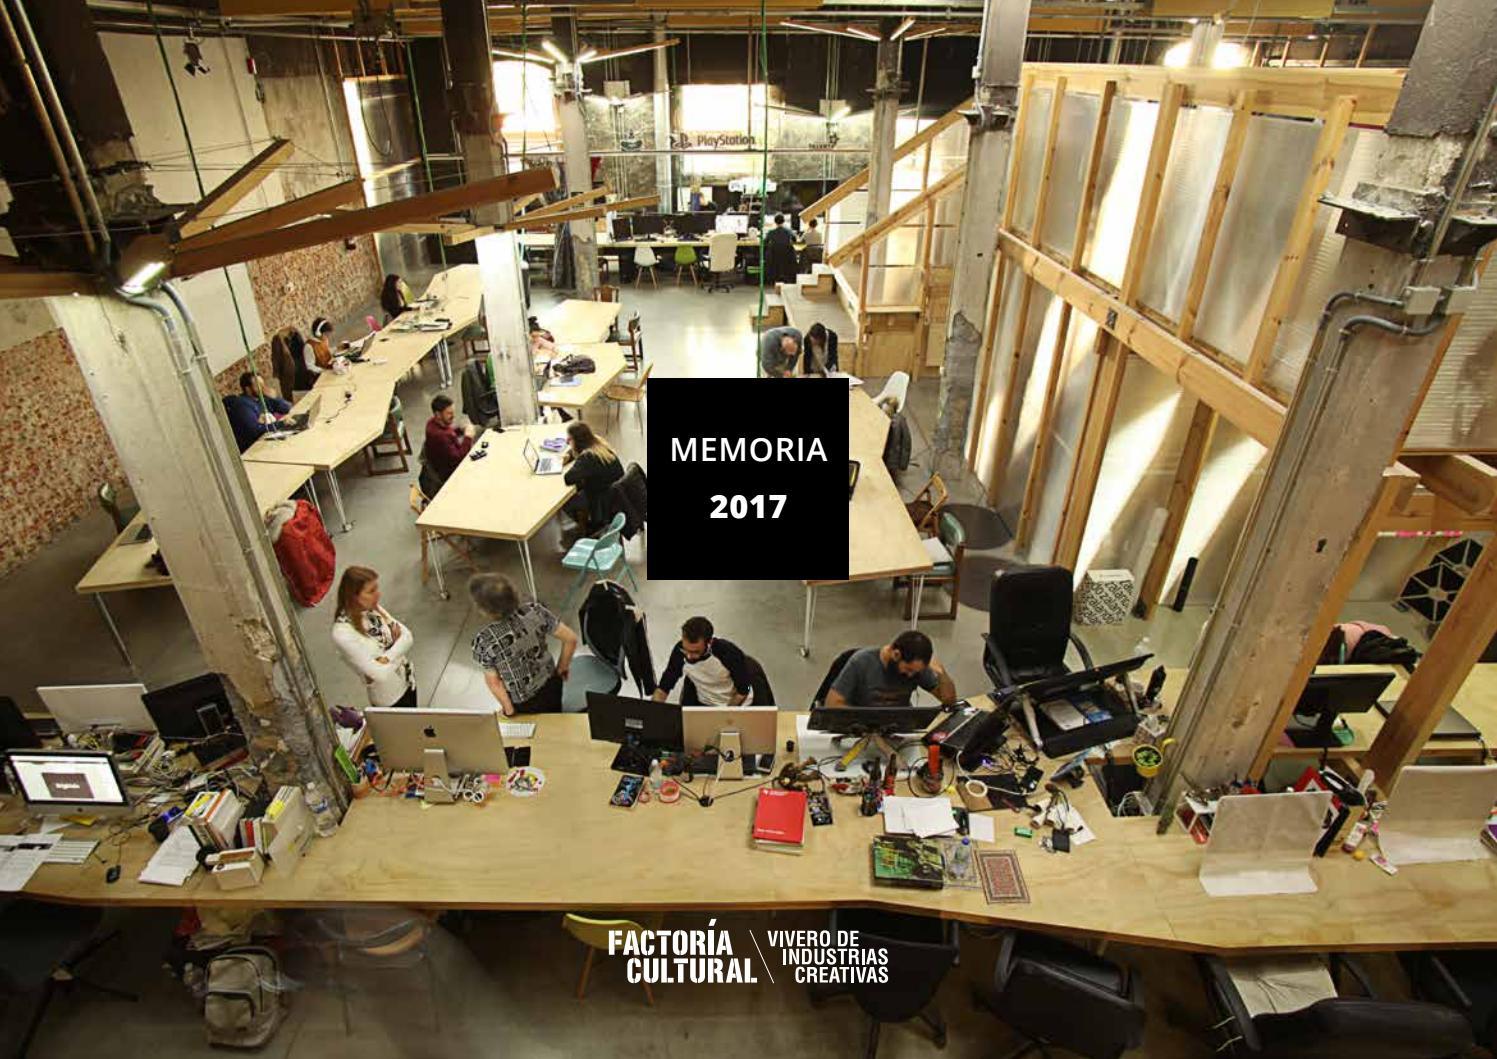 2017 Factoría Cultural 2017 Factoría 2017 Factoría Cultural Memoria Cultural Memoria Memoria n0mNOv8w